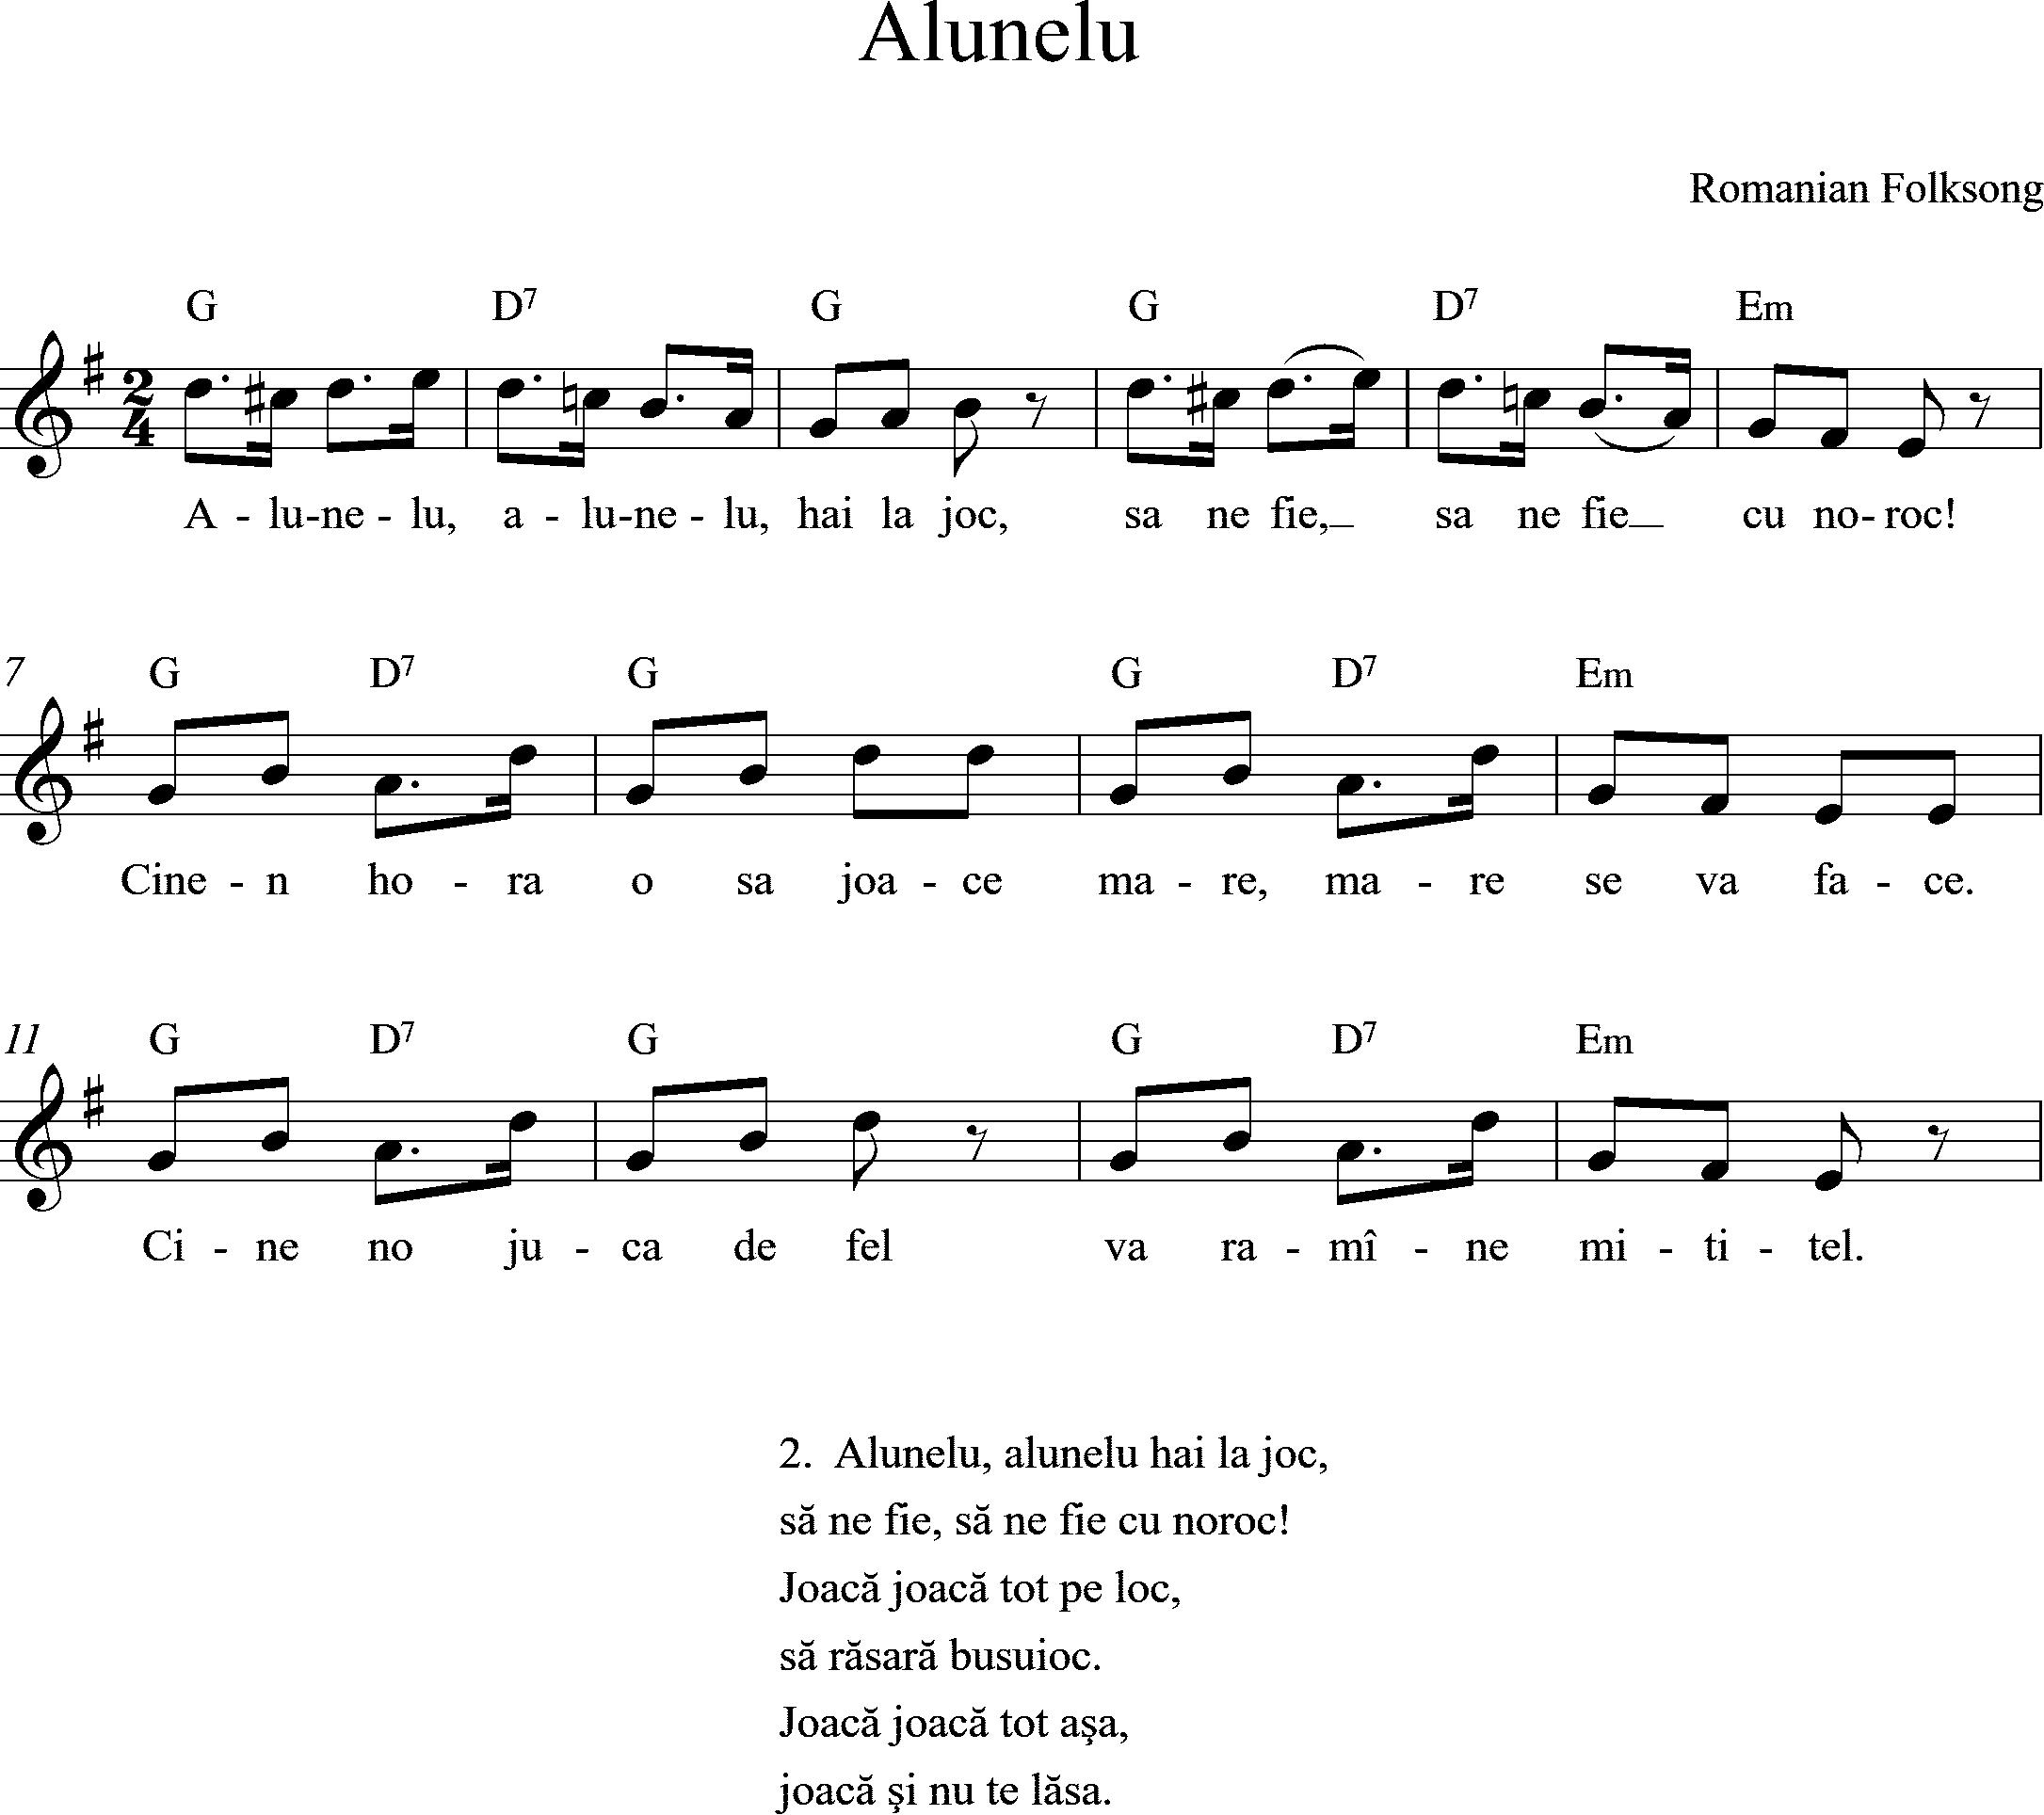 sheetmusic Alunelu